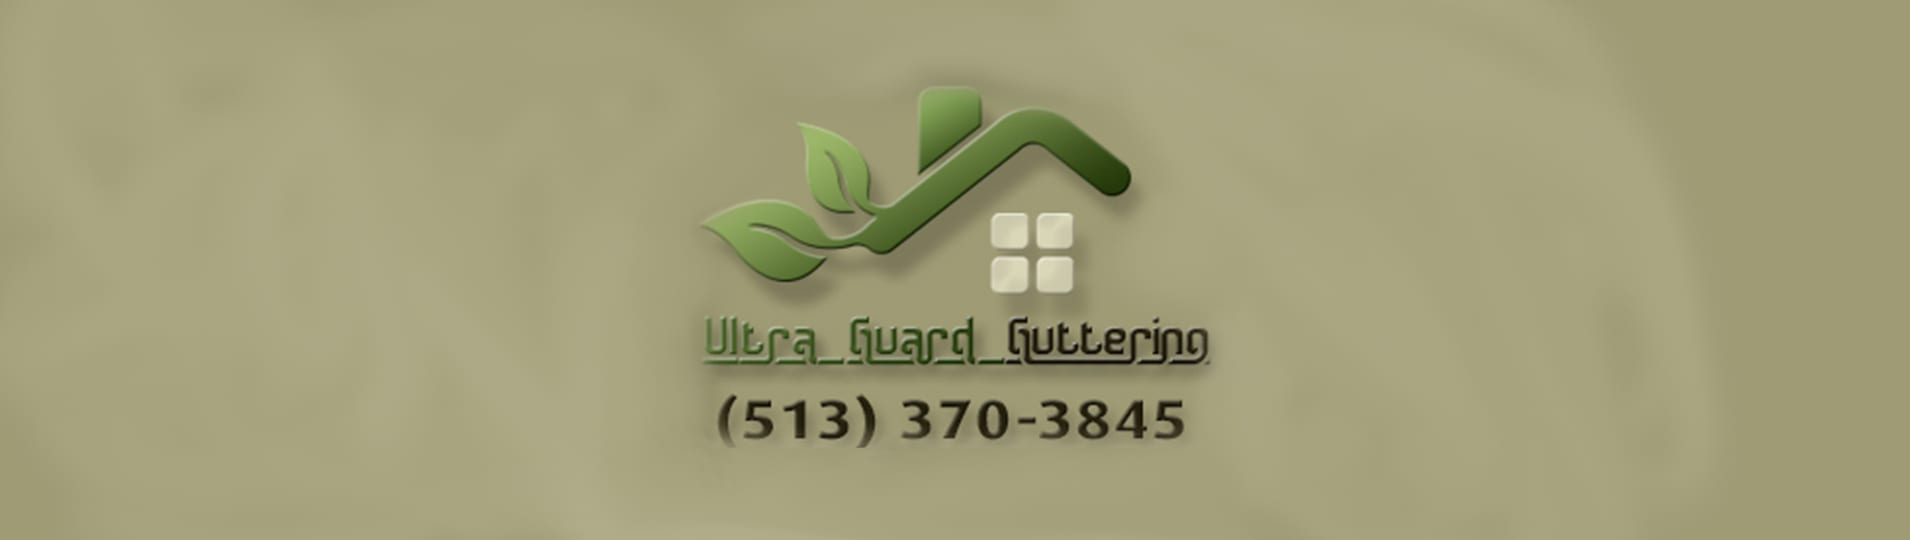 Ultra Guard Guttering Valor Gutter Guards